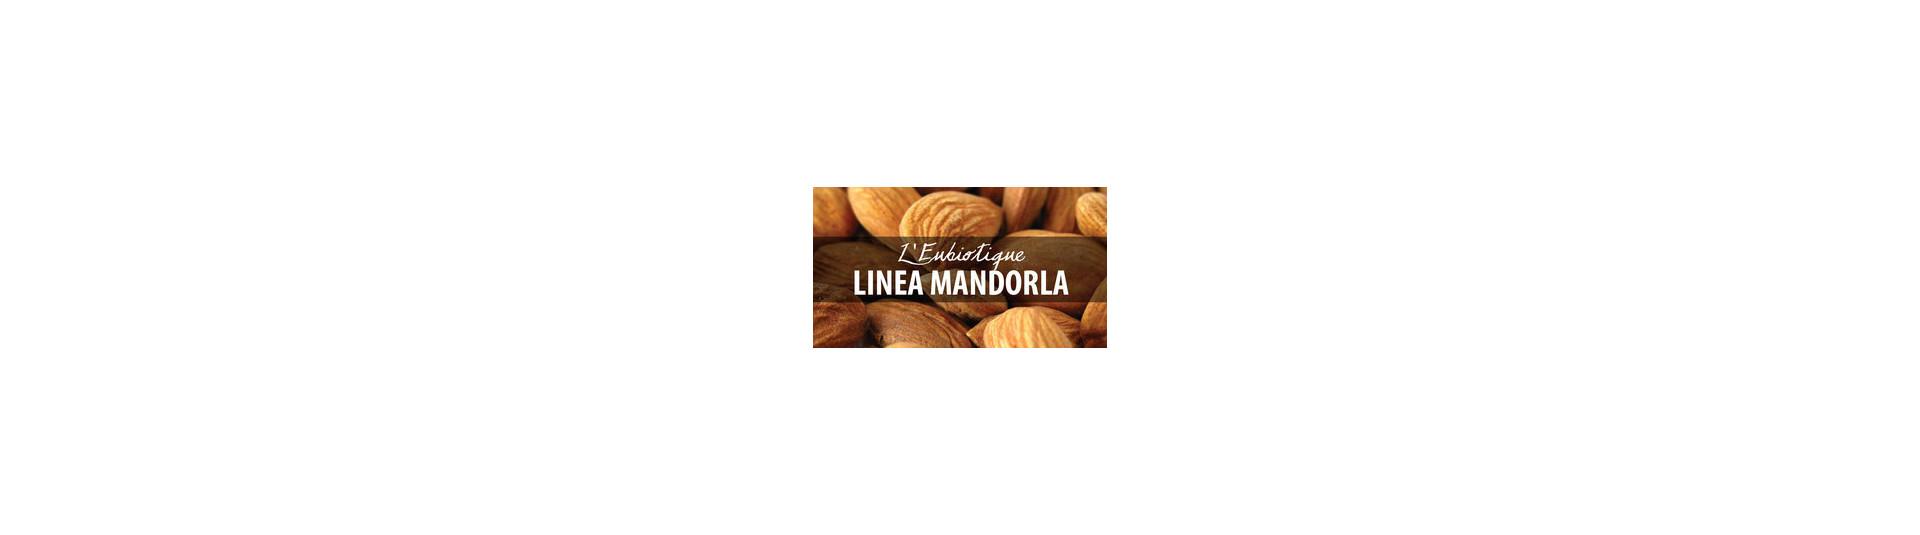 Linea Mandorla